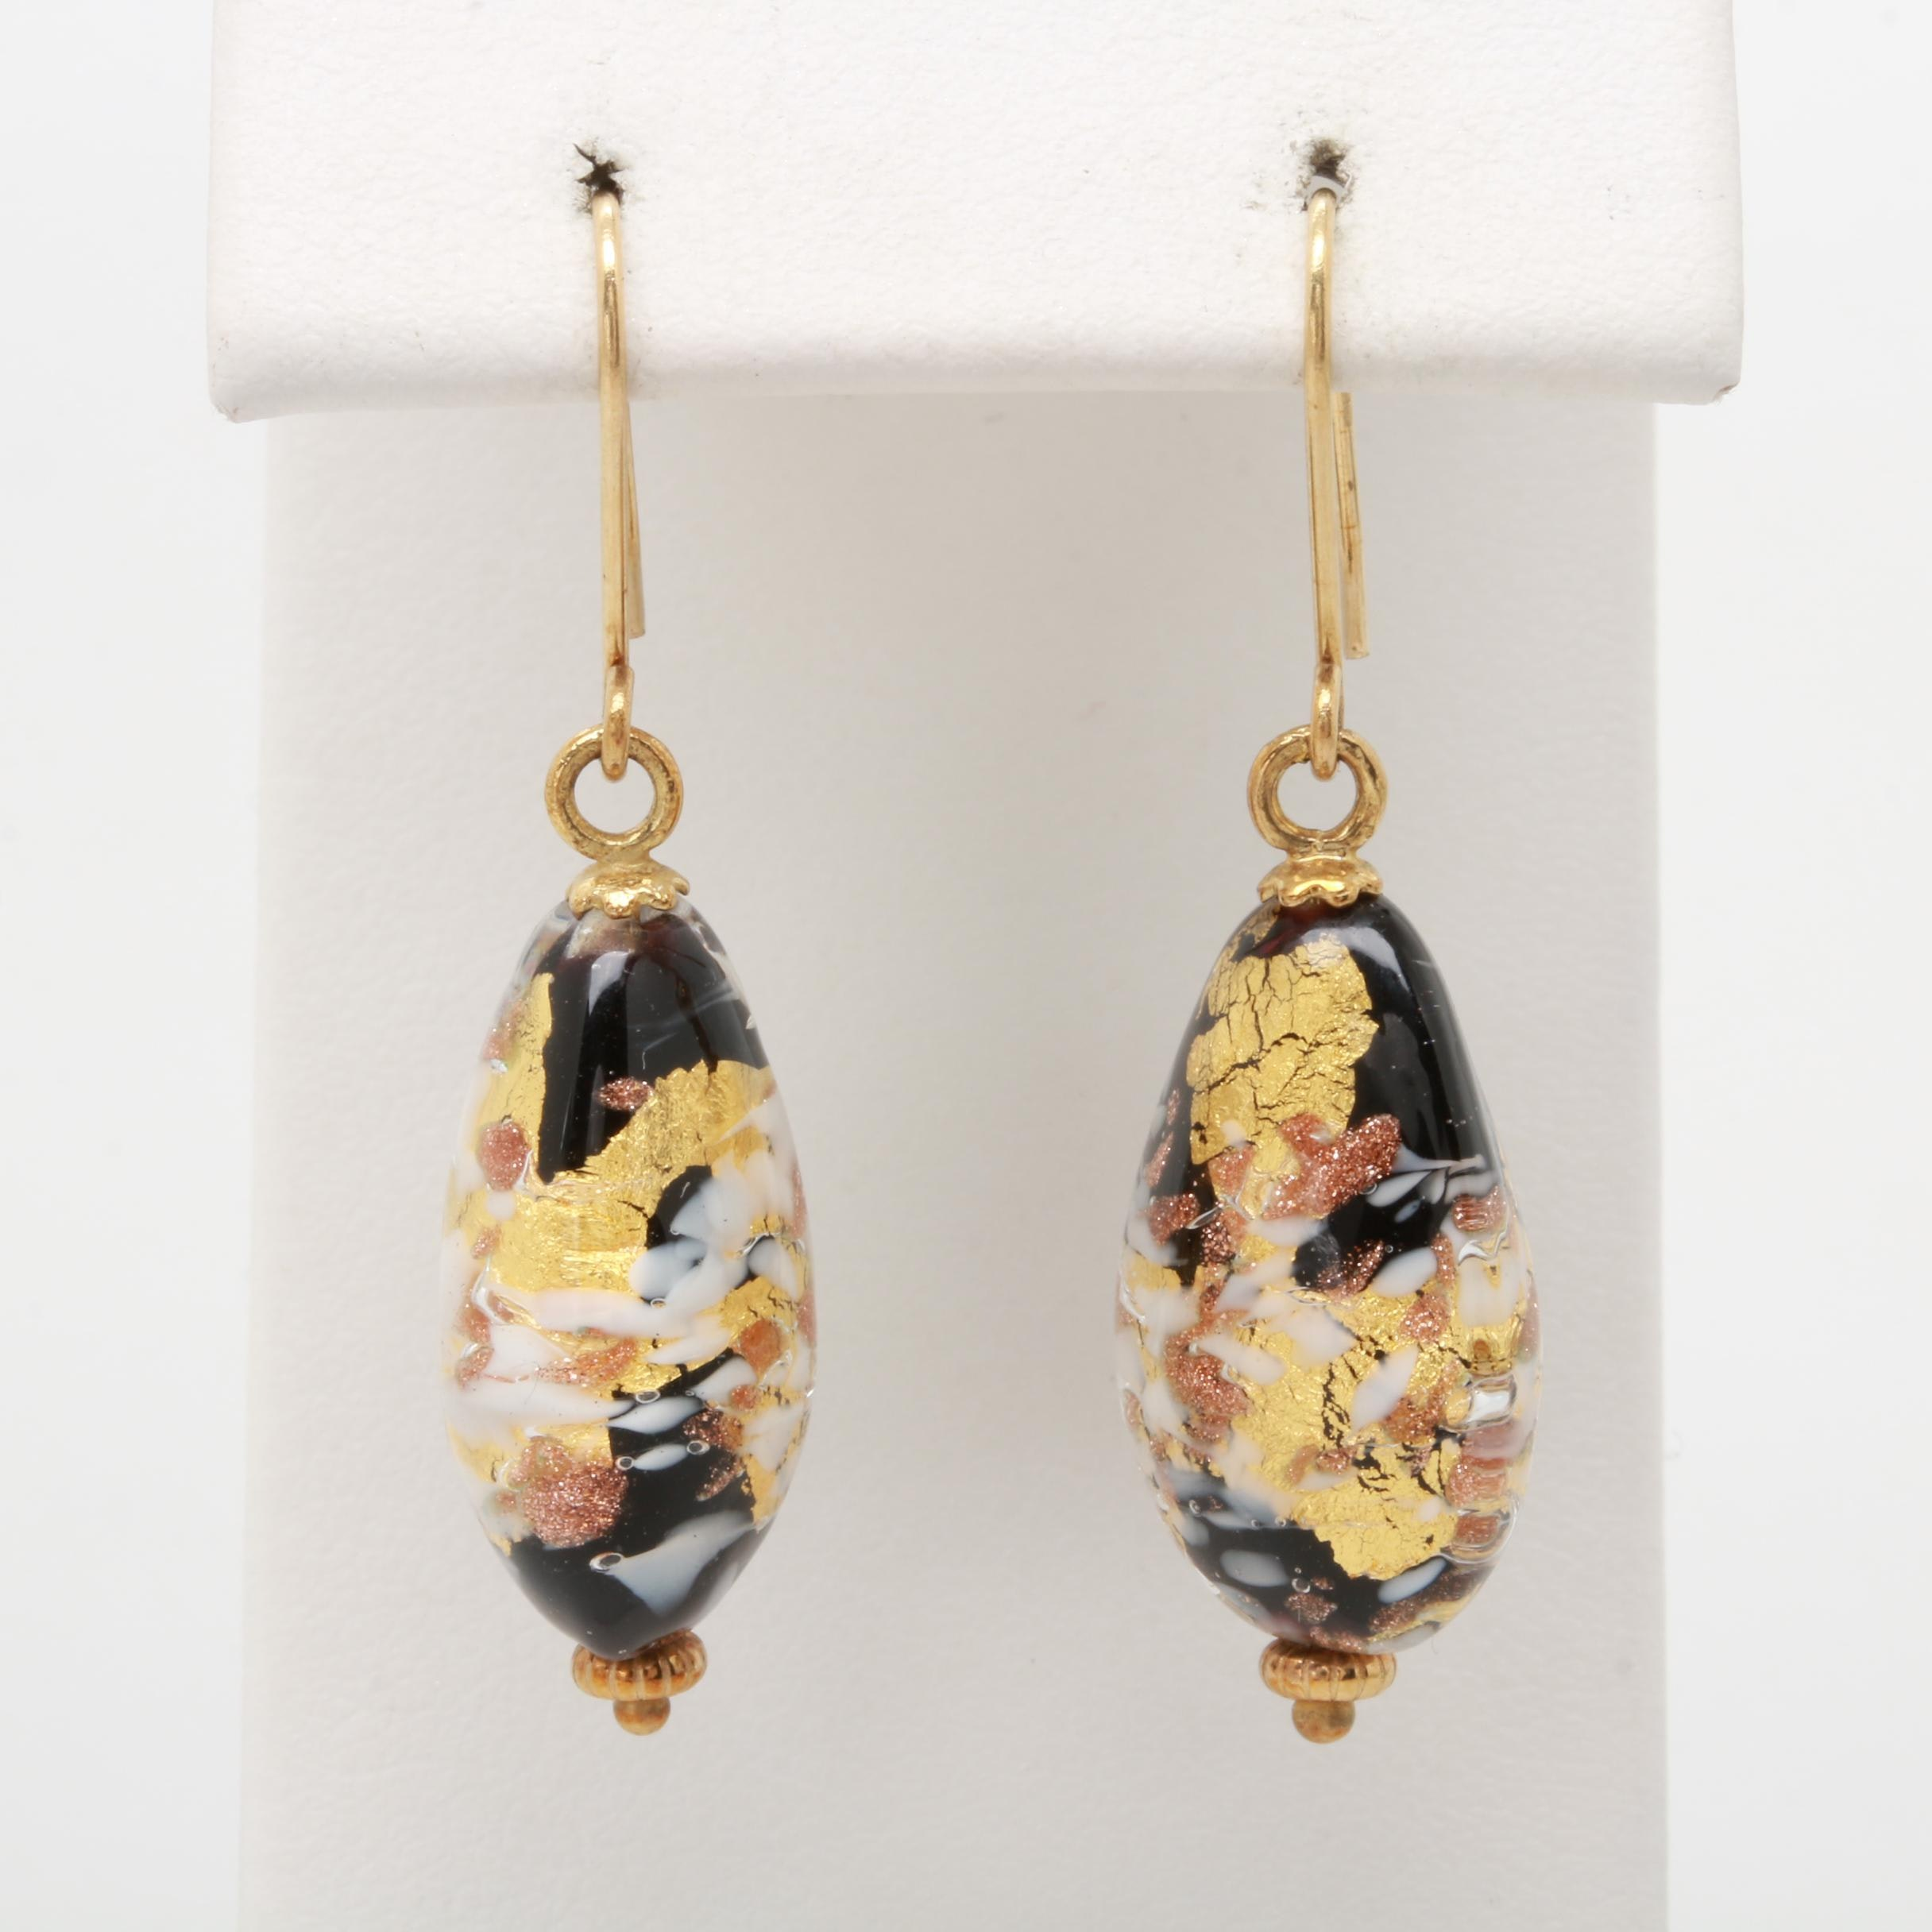 9K Yellow Gold Glass Bead Dangle Earrings